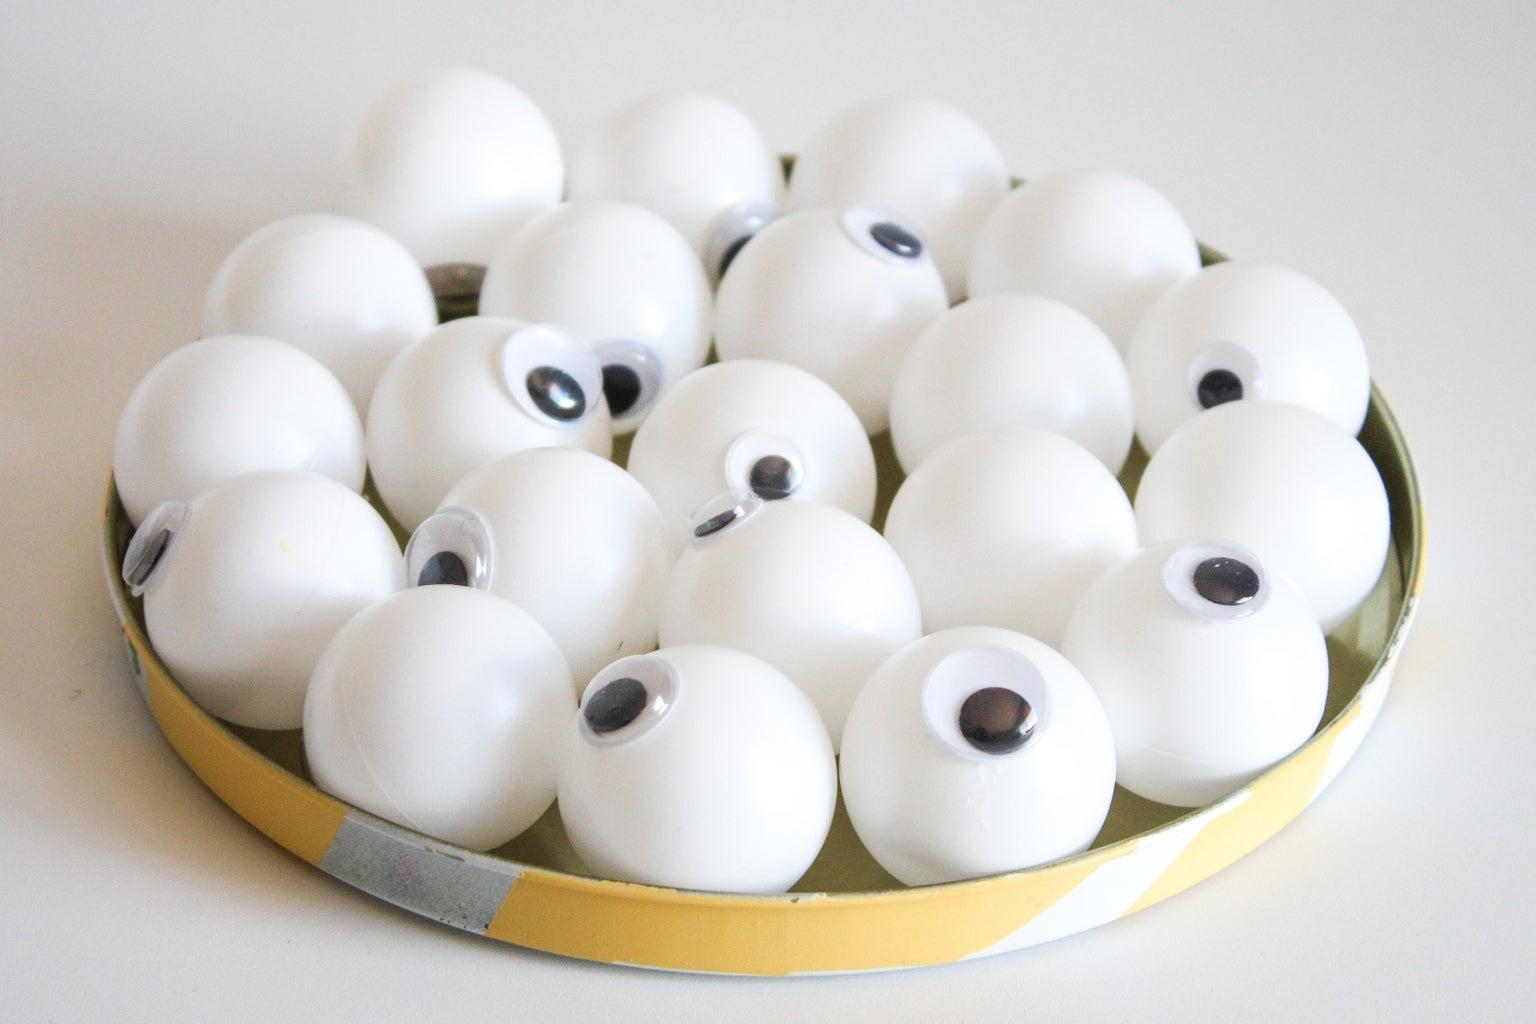 Make the Eyeballs